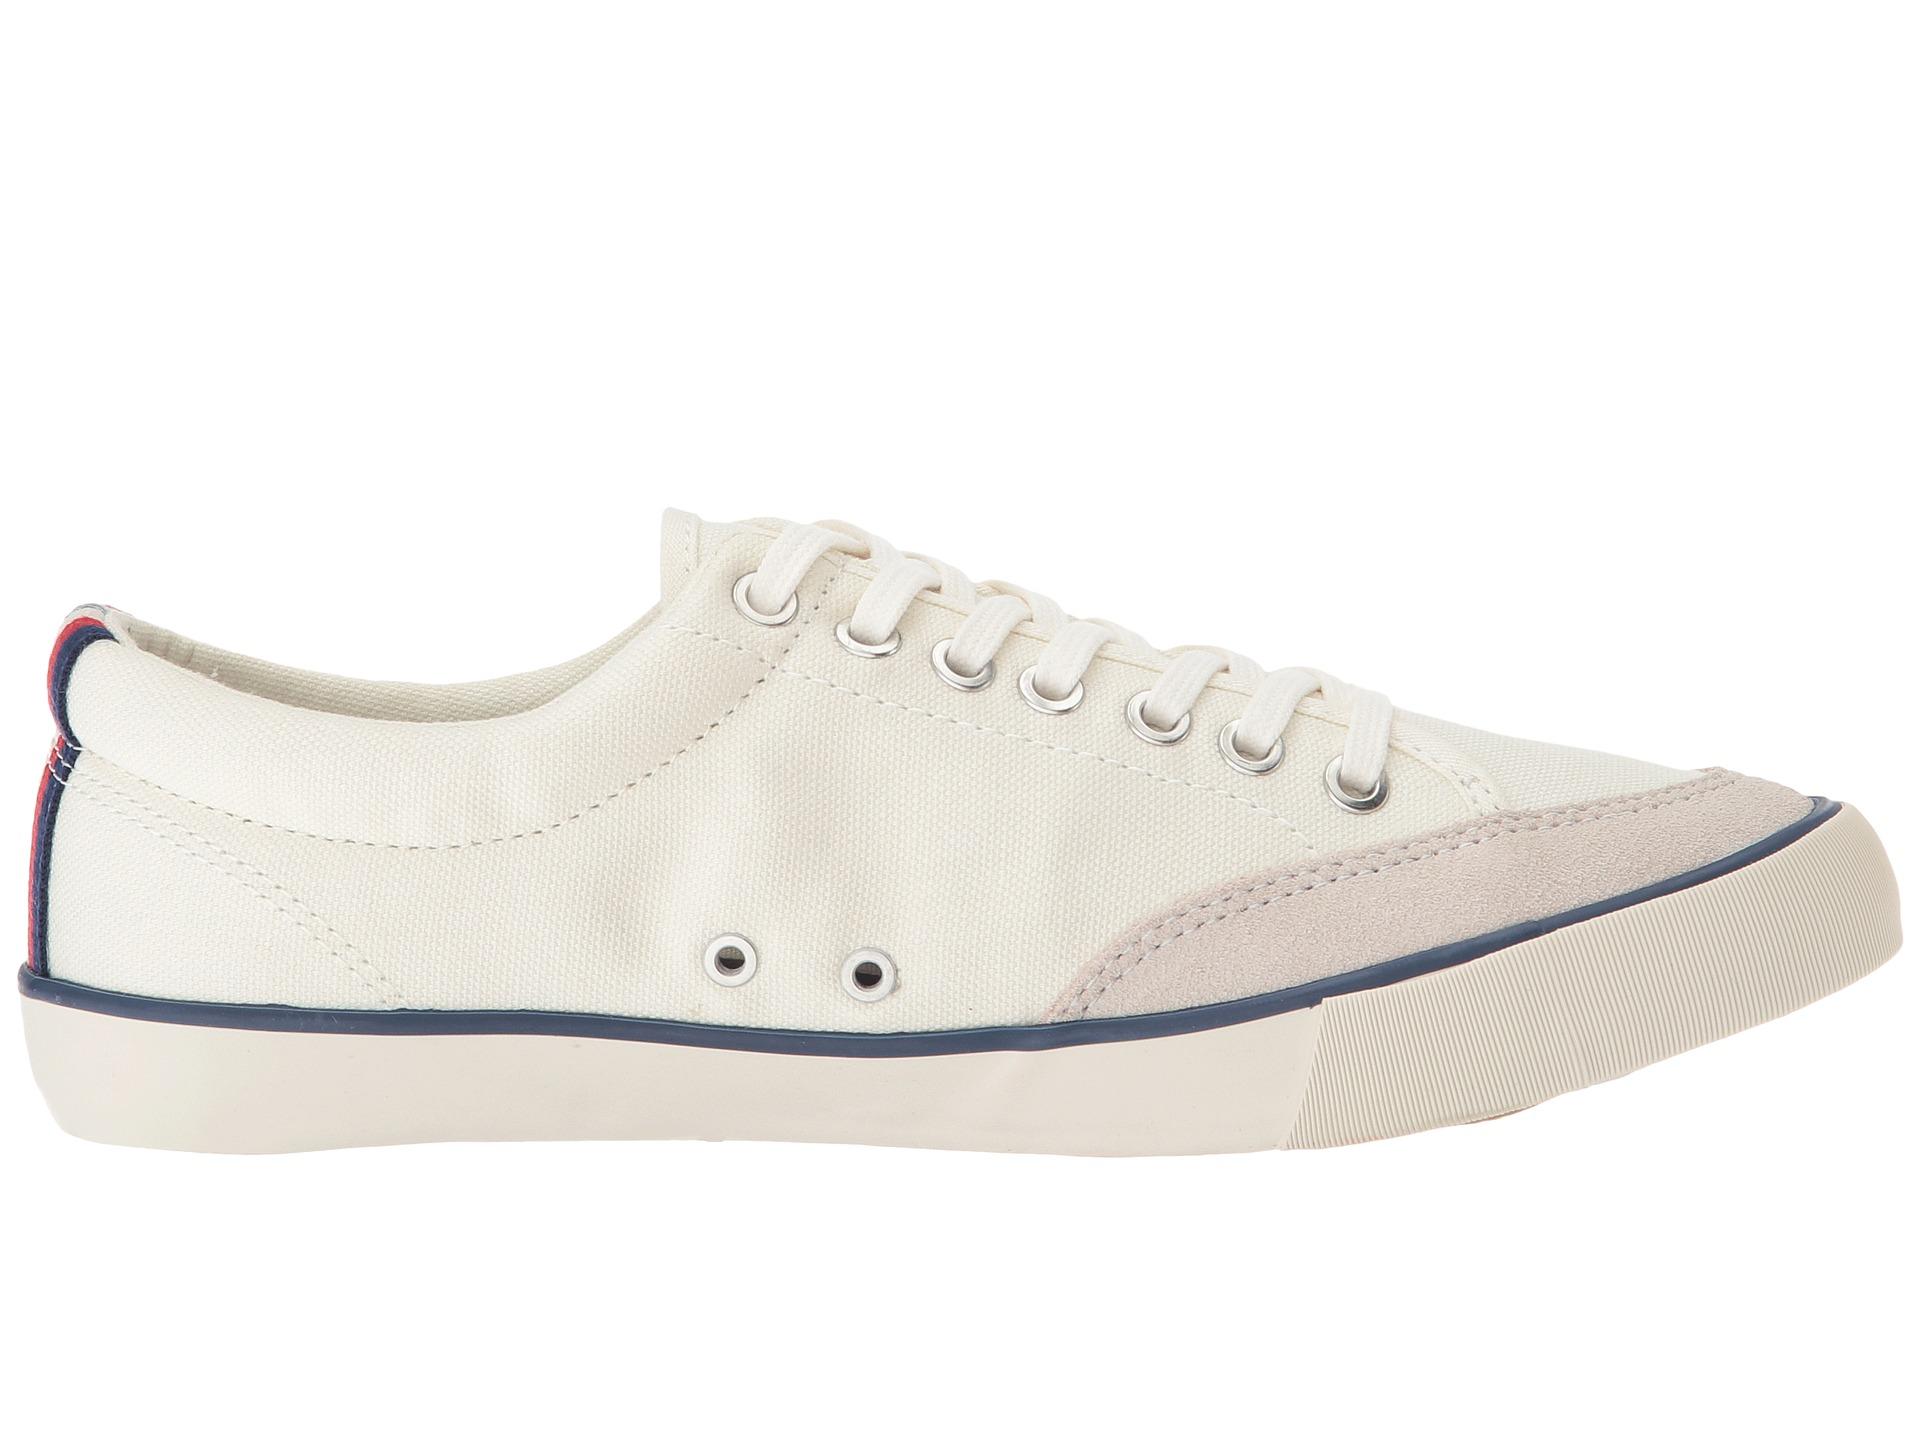 seavees 05 65 westwood tennis shoe zappos free